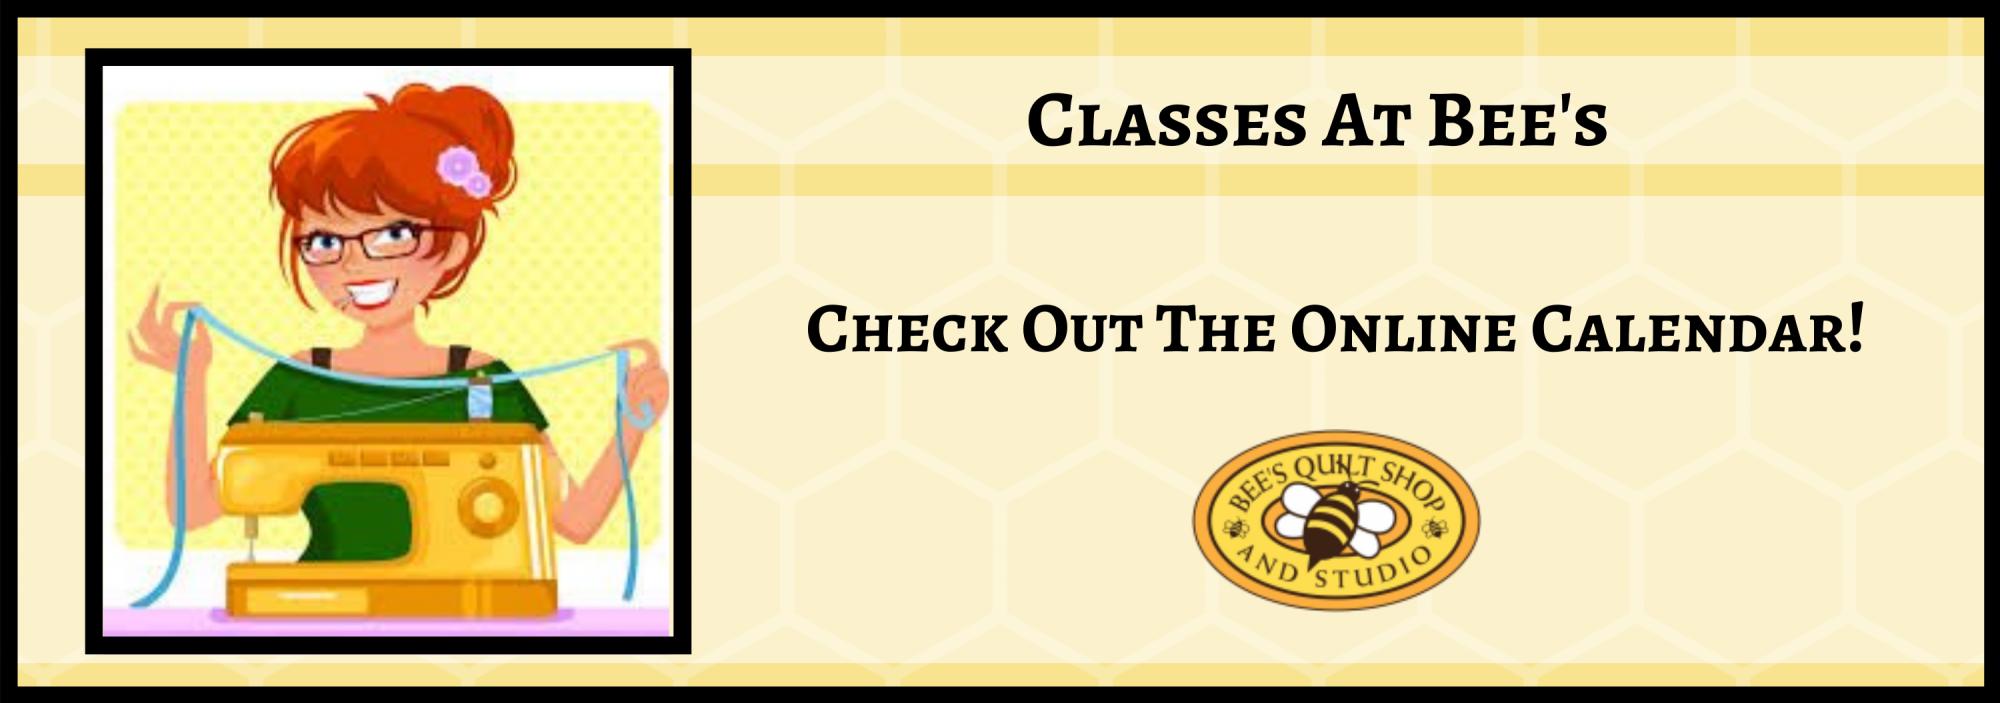 bees quilt shop st augustine